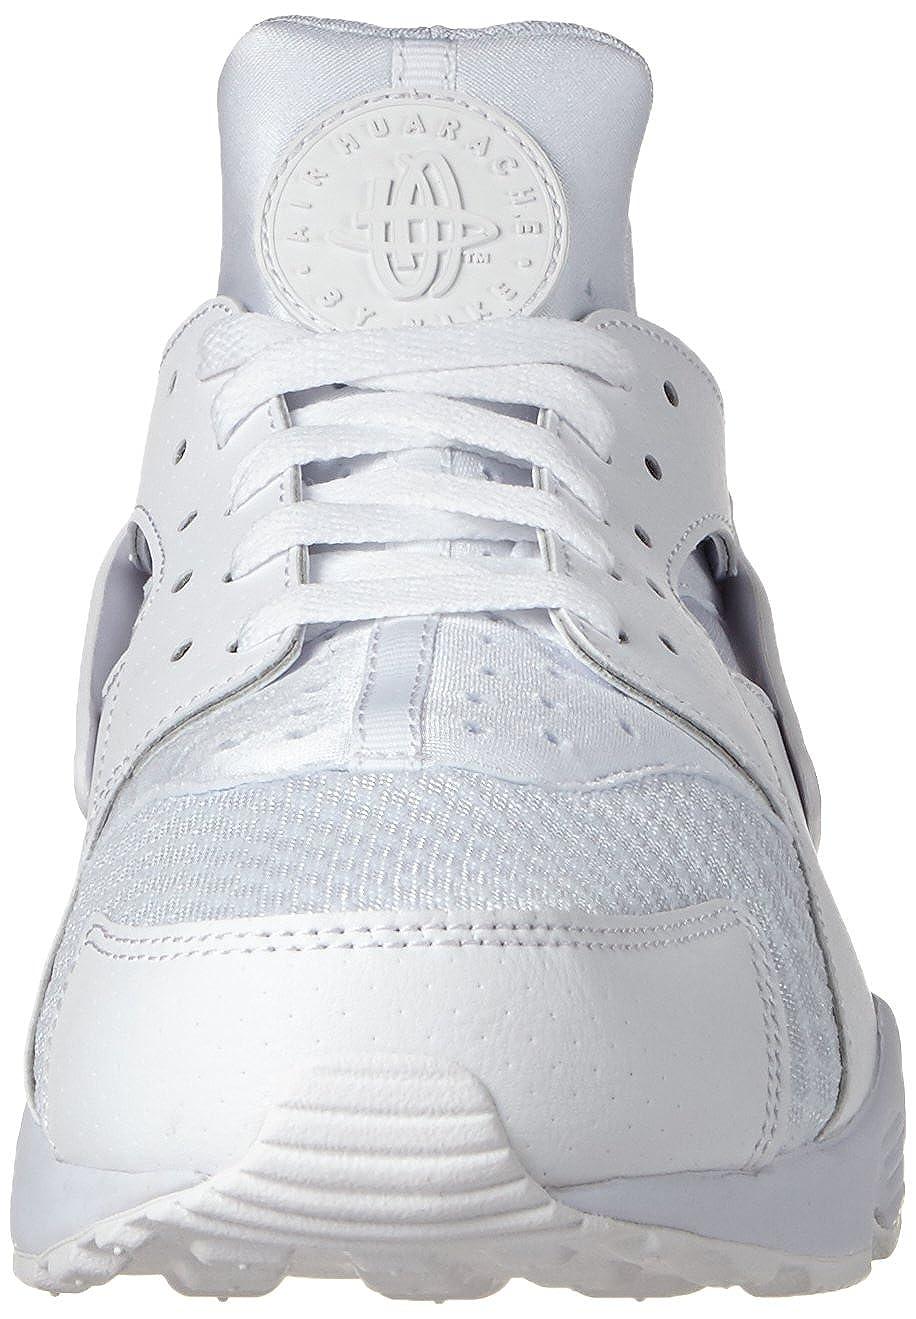 Nike Herren Air Huarache Turnschuhe Turnschuhe Turnschuhe B00TIP1ARK  3085fe